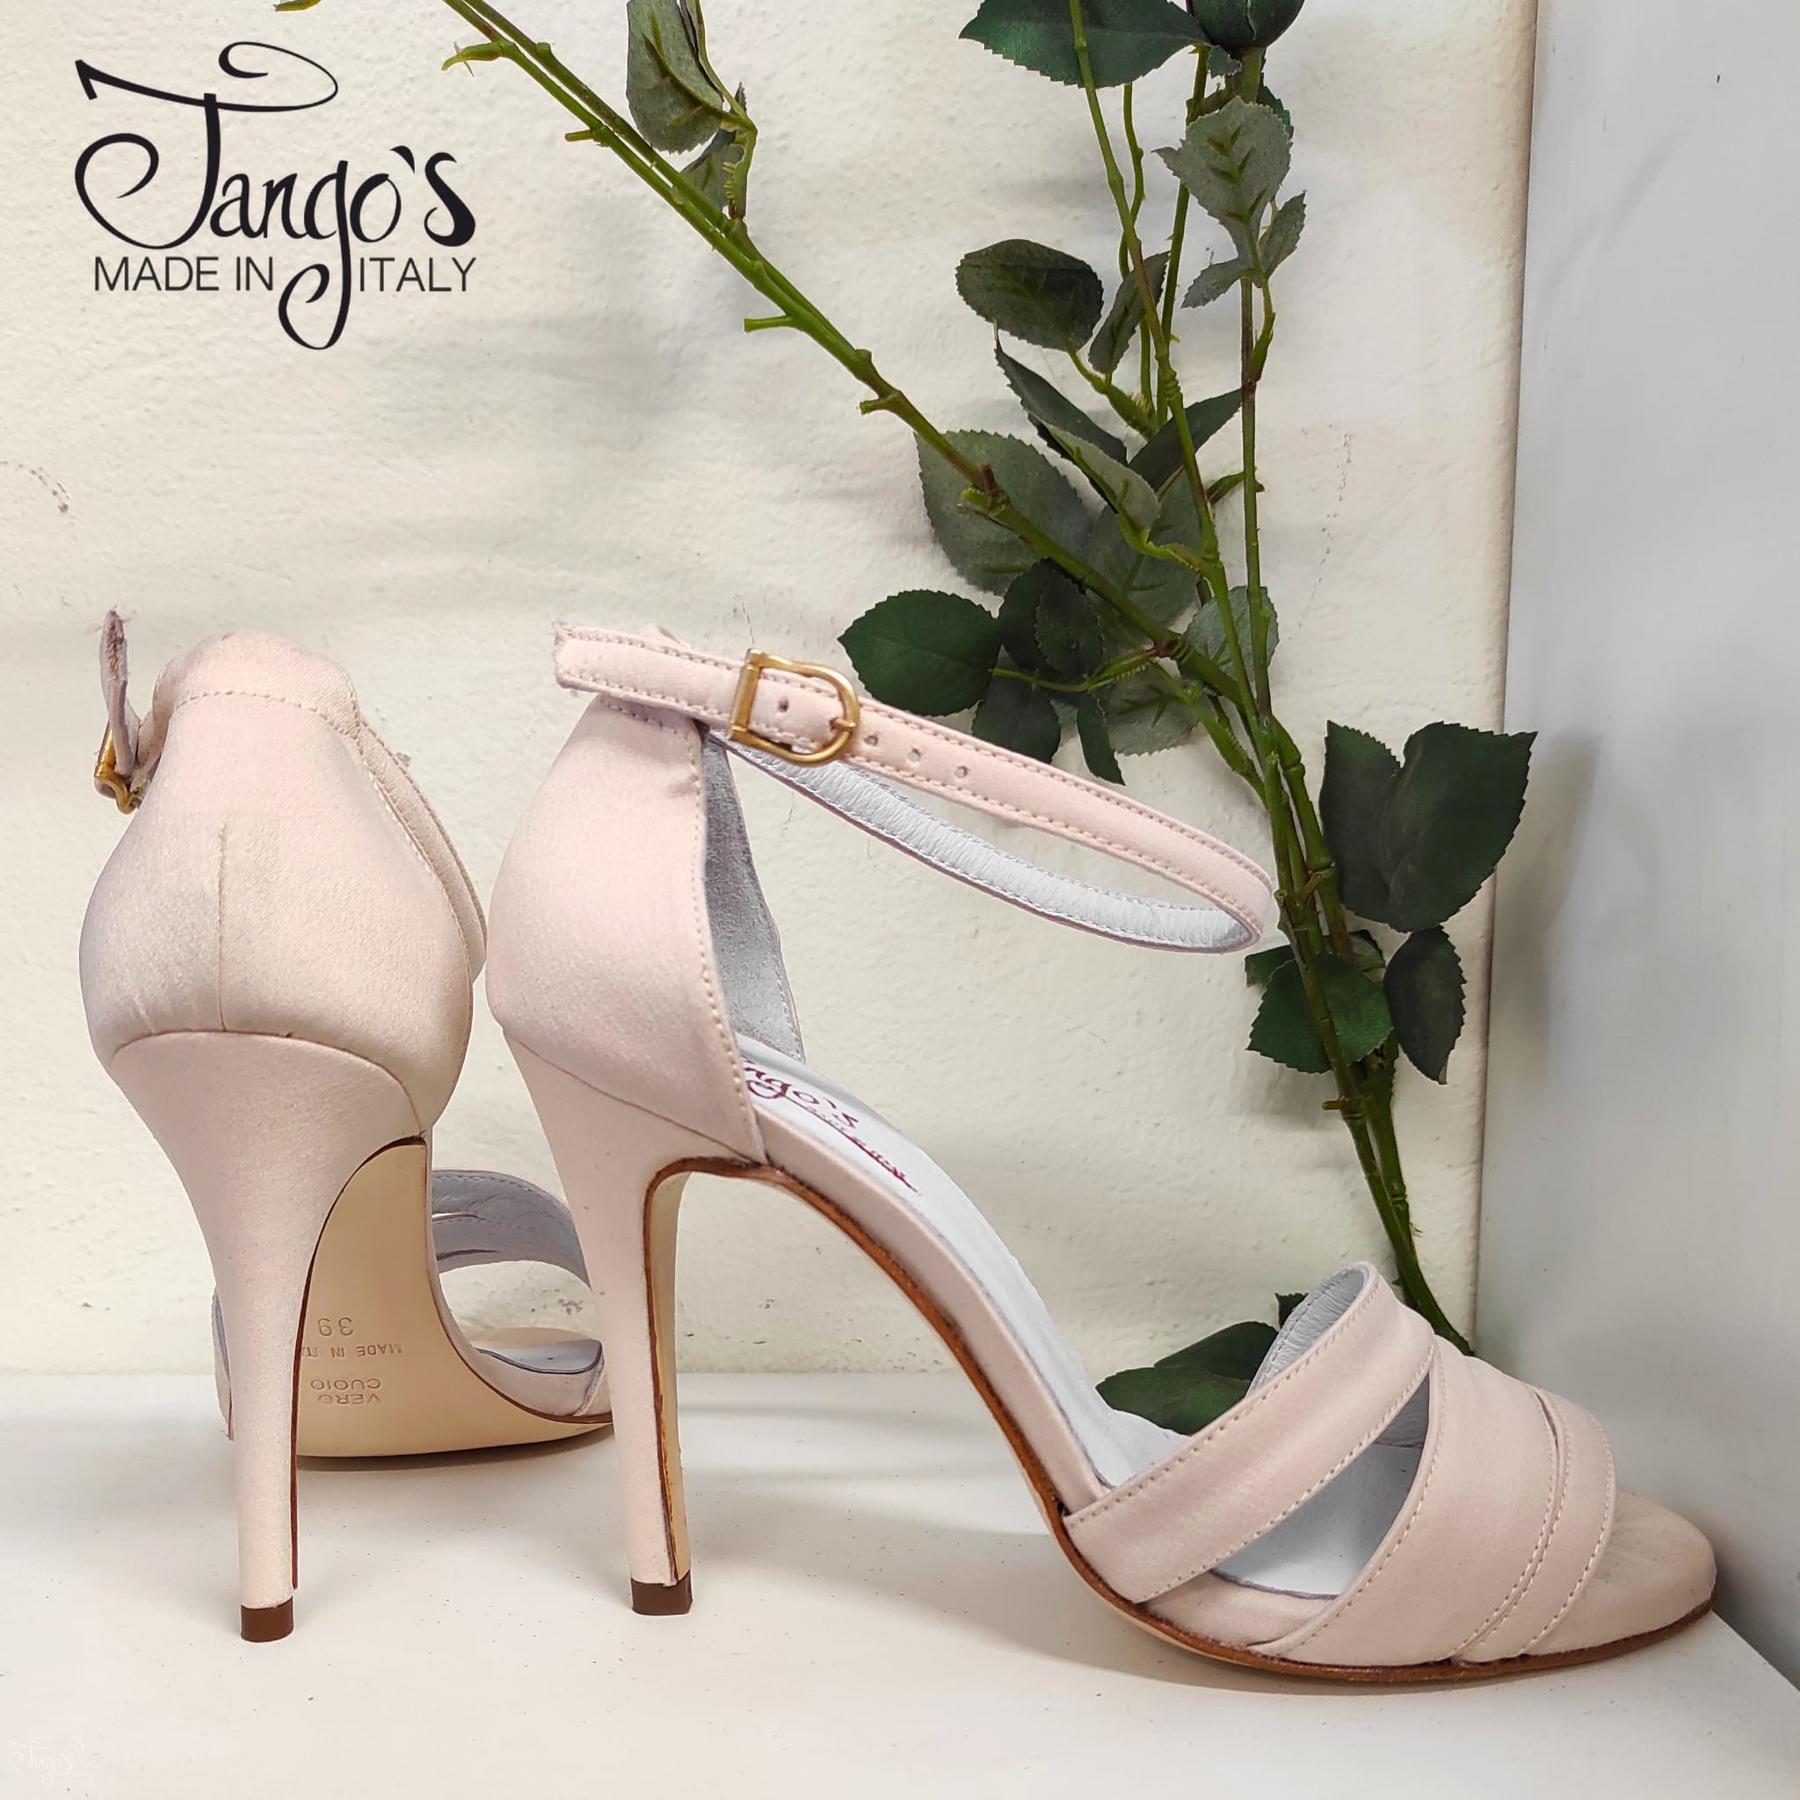 Sandalo Modello La Plata Beige